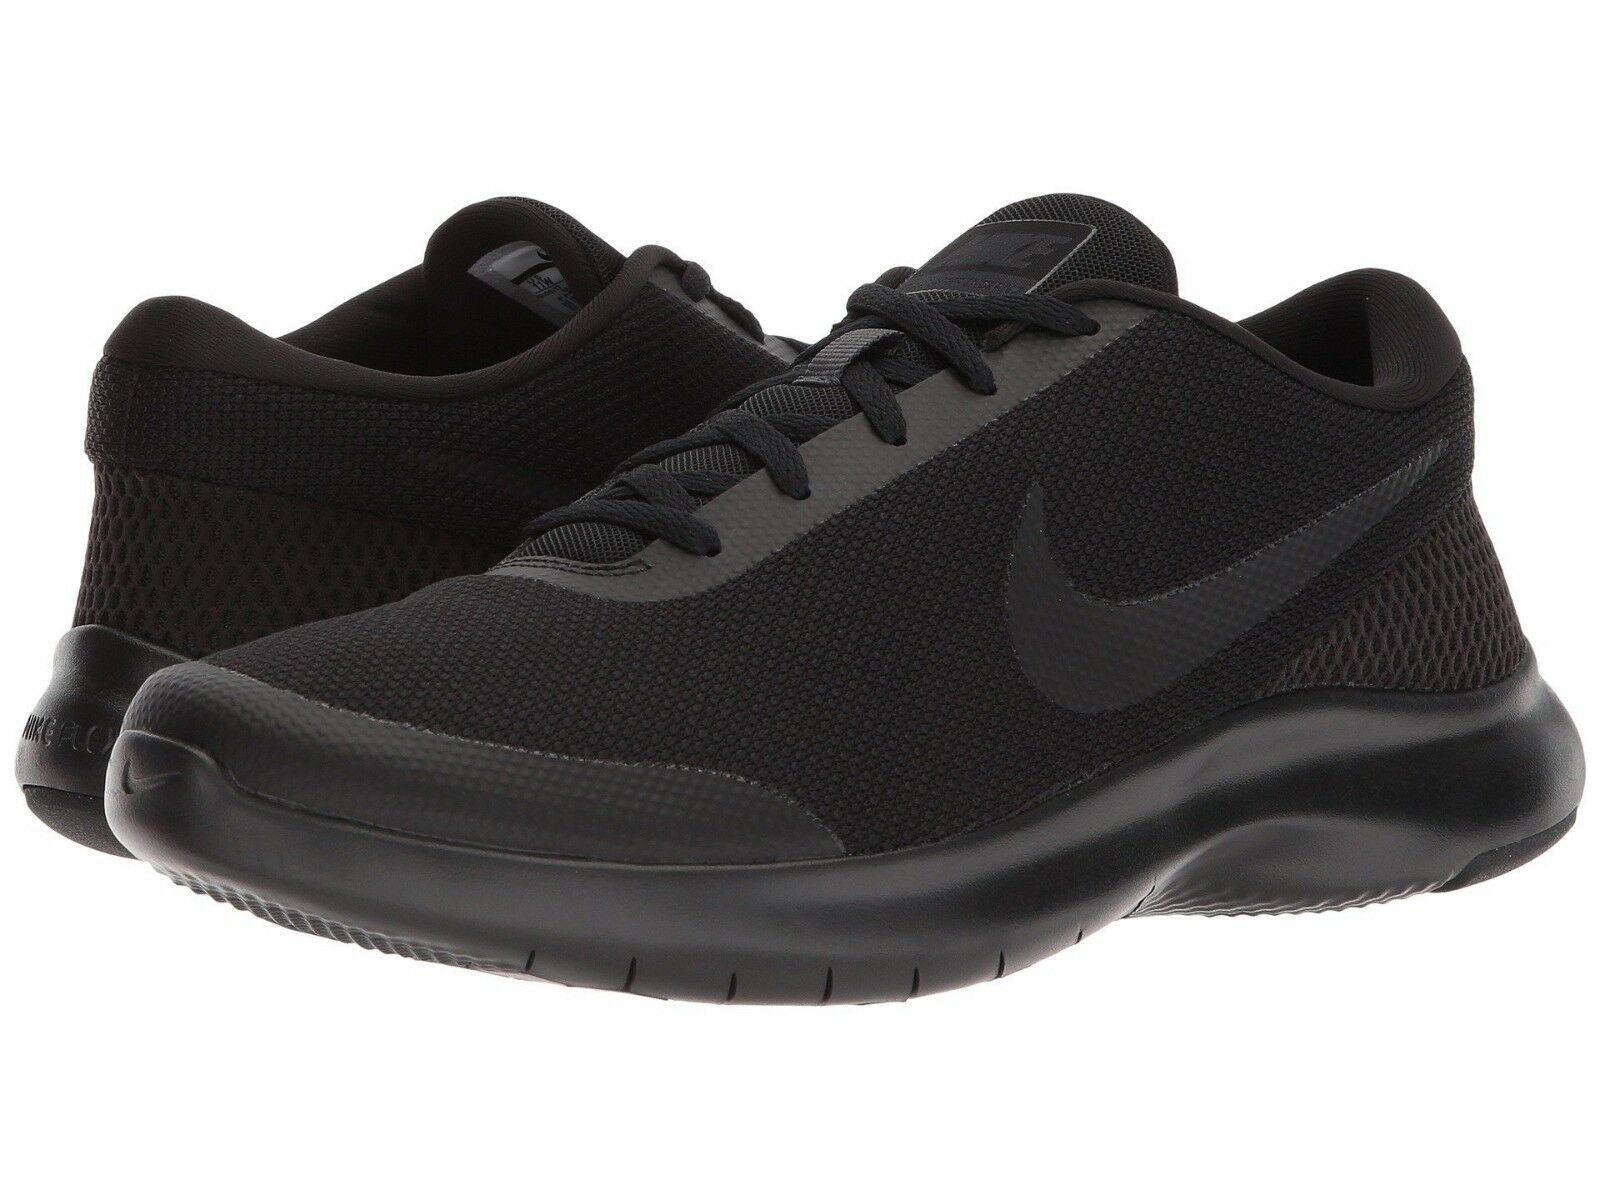 Nike Men's Flex Experience RN 7 4E Running shoes AA7405 002 Black Black